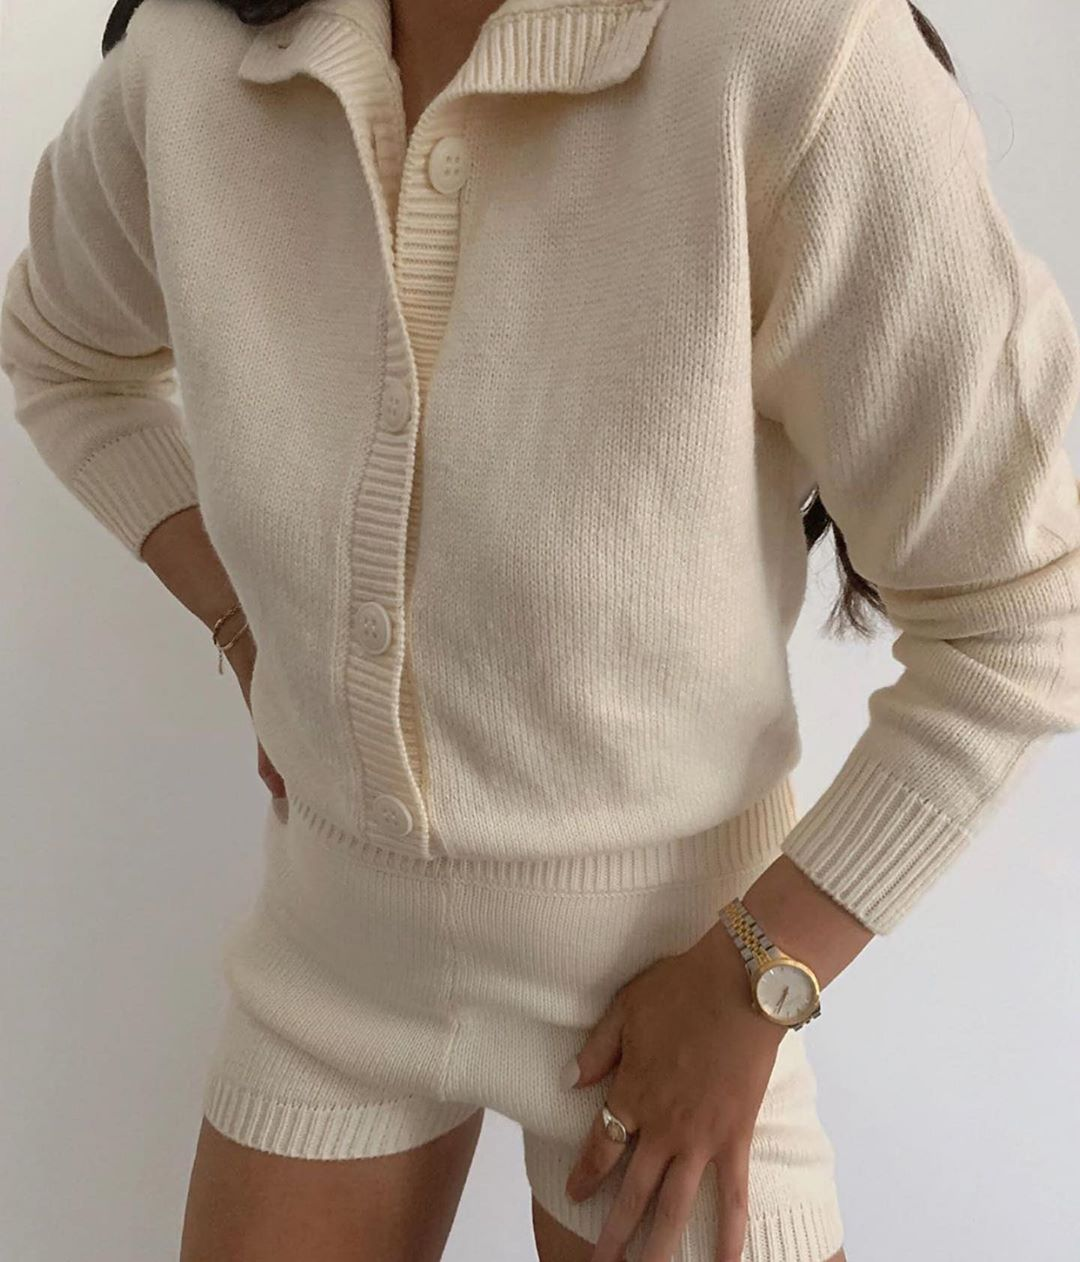 limited edition knit jumpsuit de Zara sur zaraaddiction